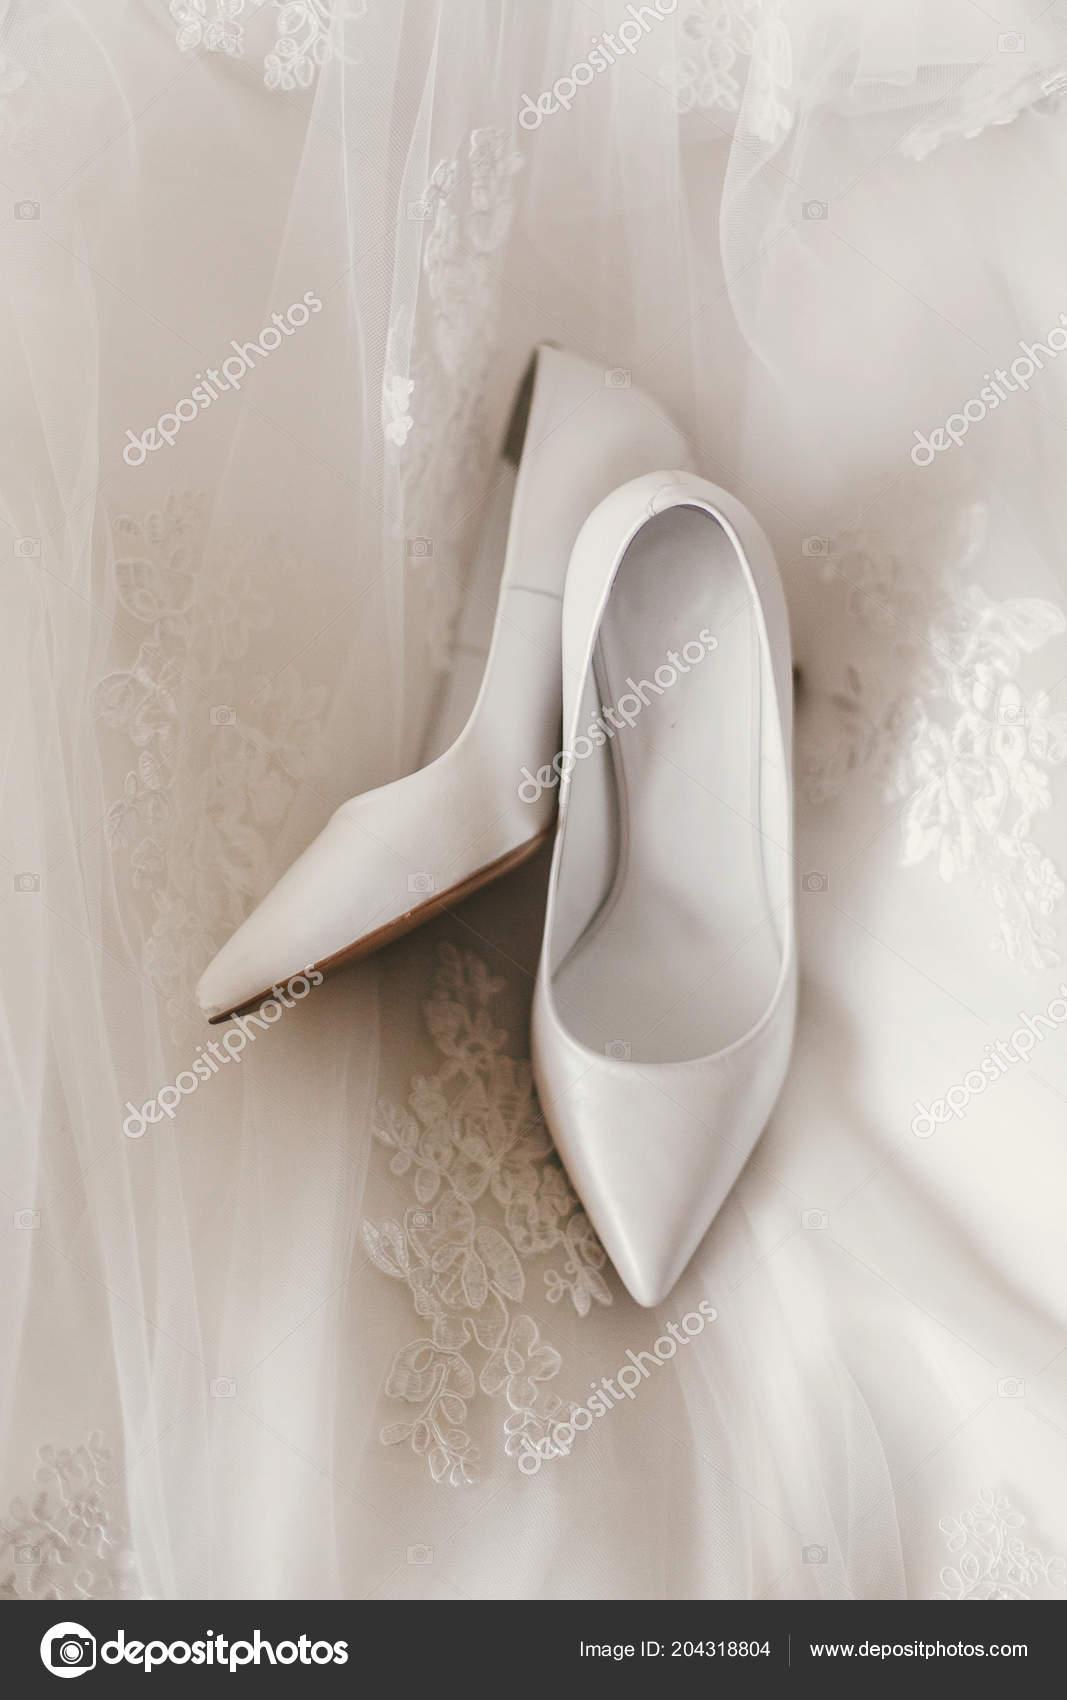 Seda Lujo Blanco Con Estilo Hermosos Sencillos Vestido Novia Zapatos c3lKFTJ1